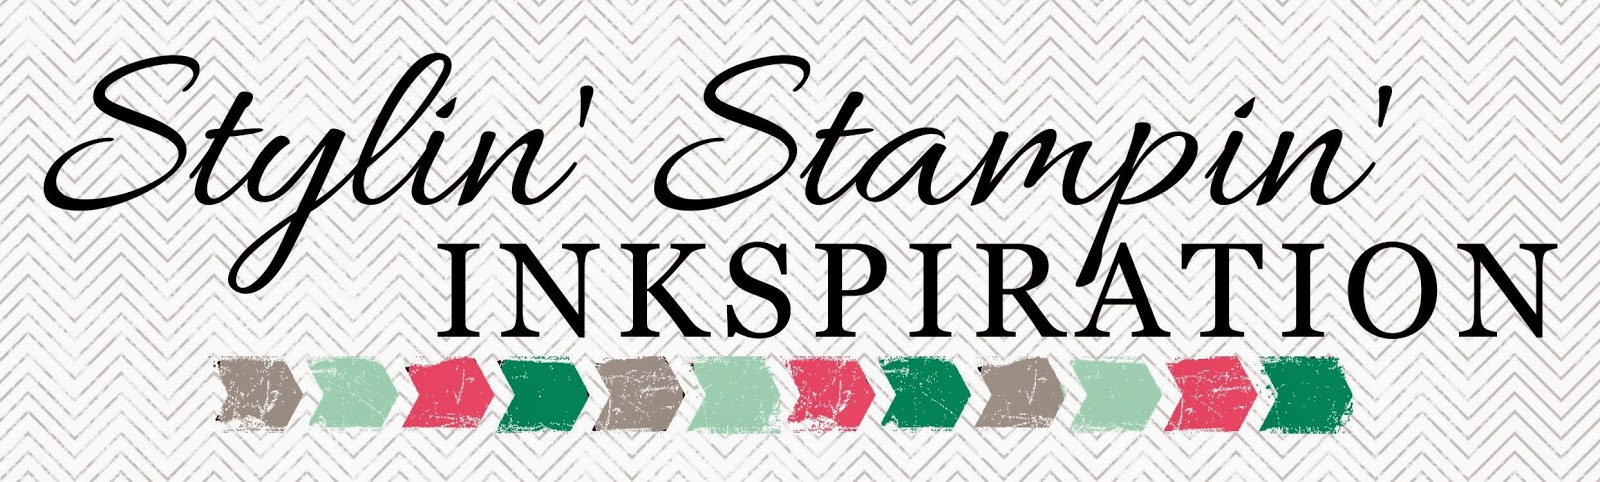 http://ssinkspiration.blogspot.com/2015/04/thank-you-cards.html